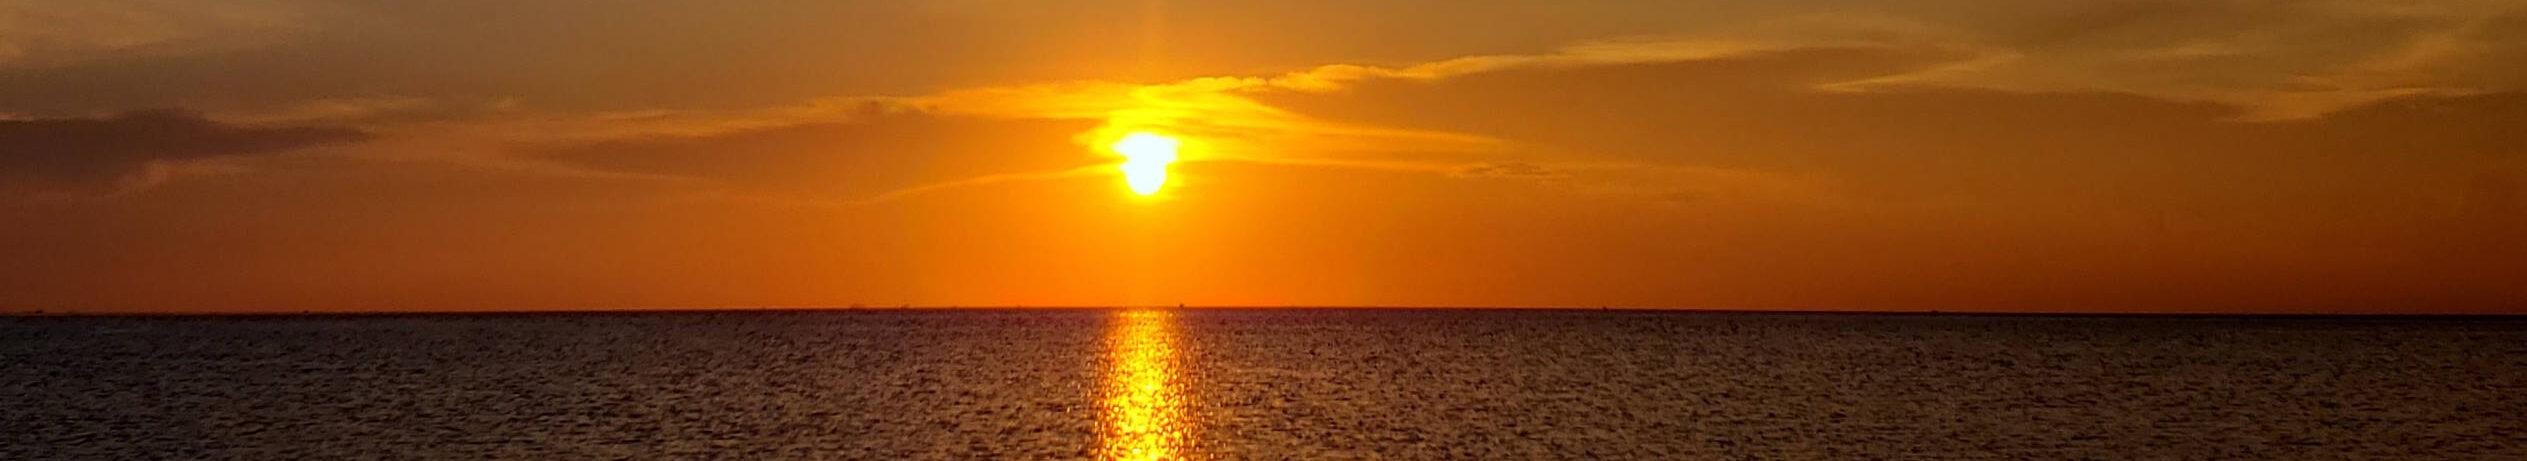 sunset_meditation